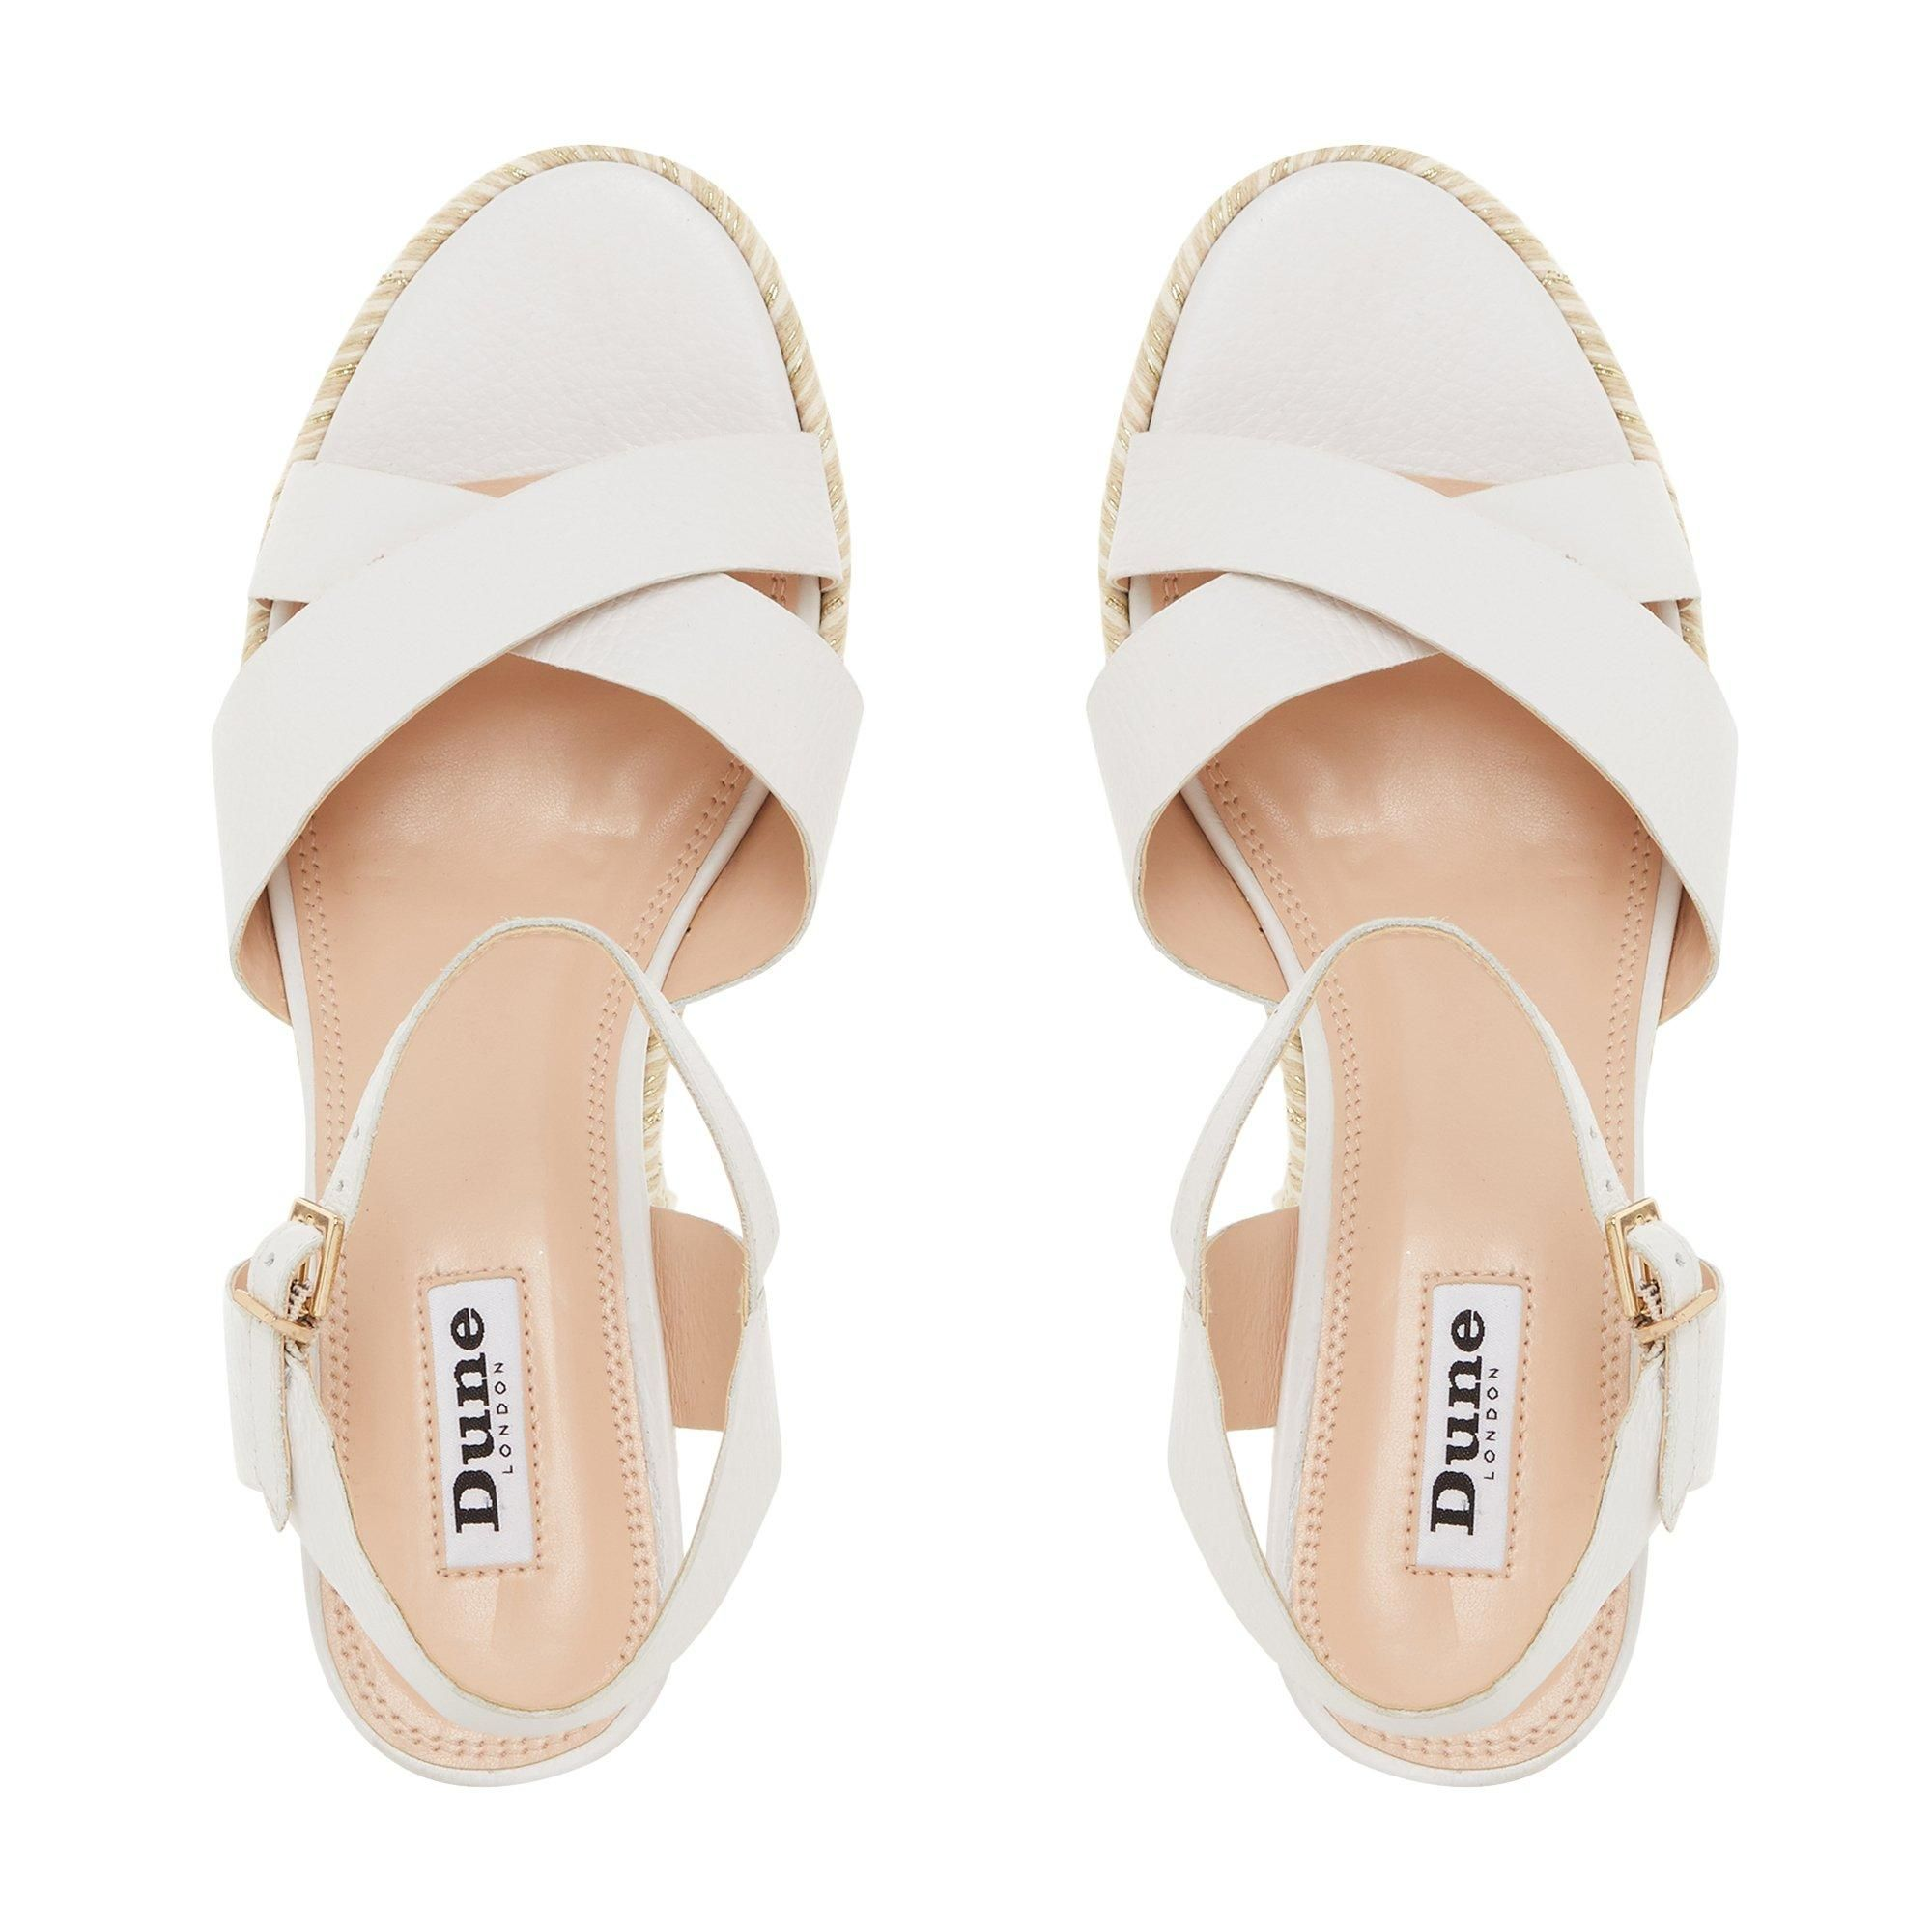 Dune Ladies KIWII Espadrille Trim Wedge Heel Sandals